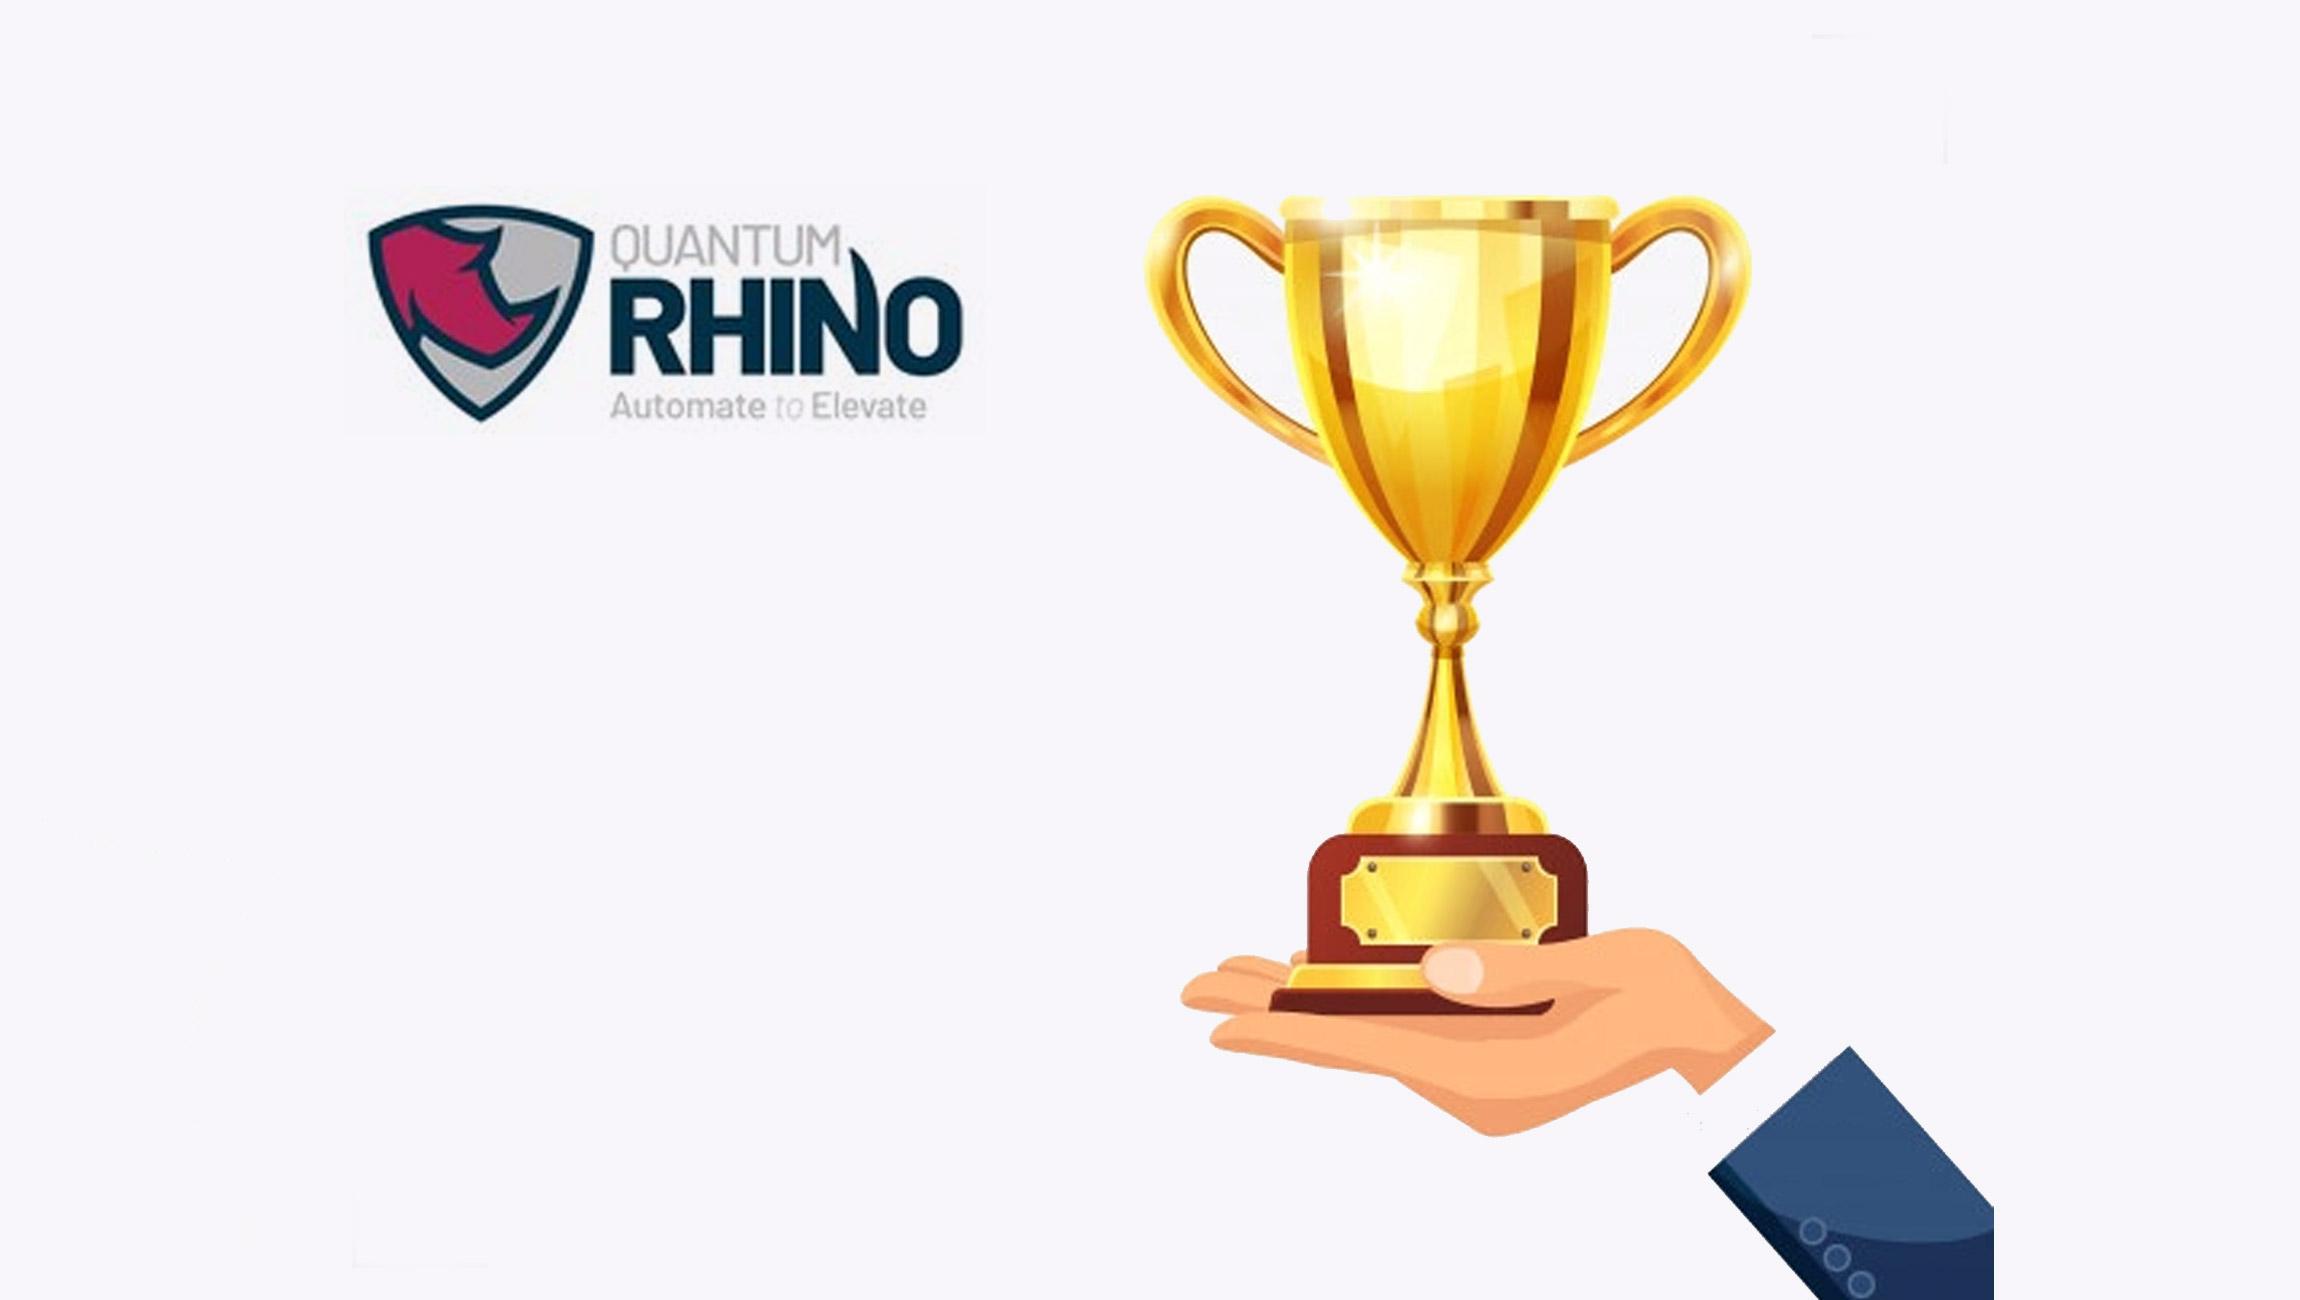 Automation-Startup-QuantumRhino-Wins-2021-Nintex-Partner-Award